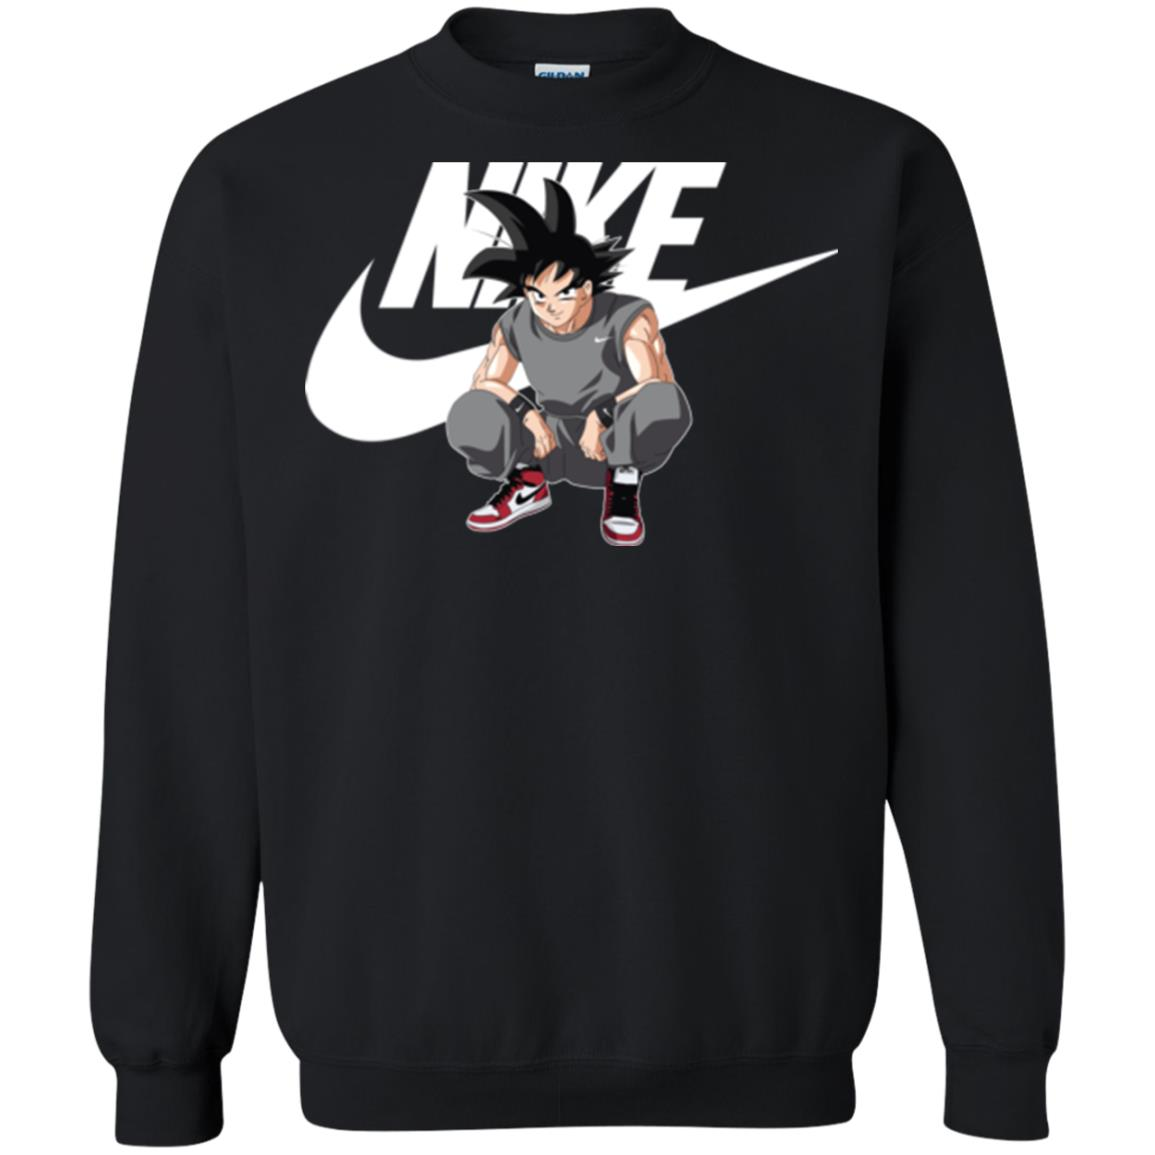 image 256px Songoku Nike Mashup T Shirt, Hoodies, Tank Top